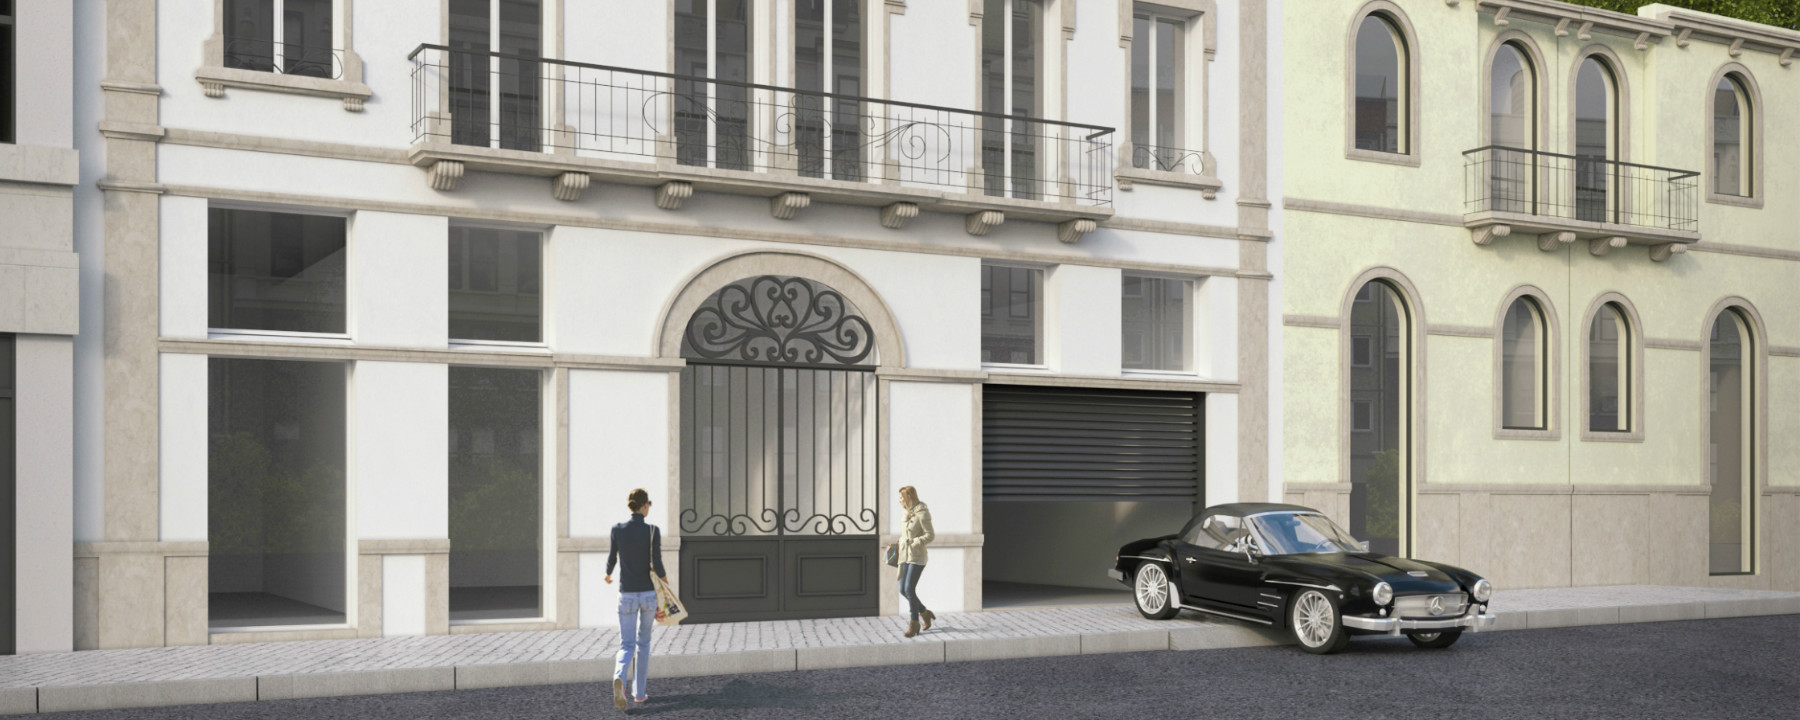 <a href='http://www.living.pt/empreendimento/6534490/joao-crisostomo-residences-lisboa/' target='_blank'>João Crisóstomo Residences <span>Conheça o empreendimento</span></a>